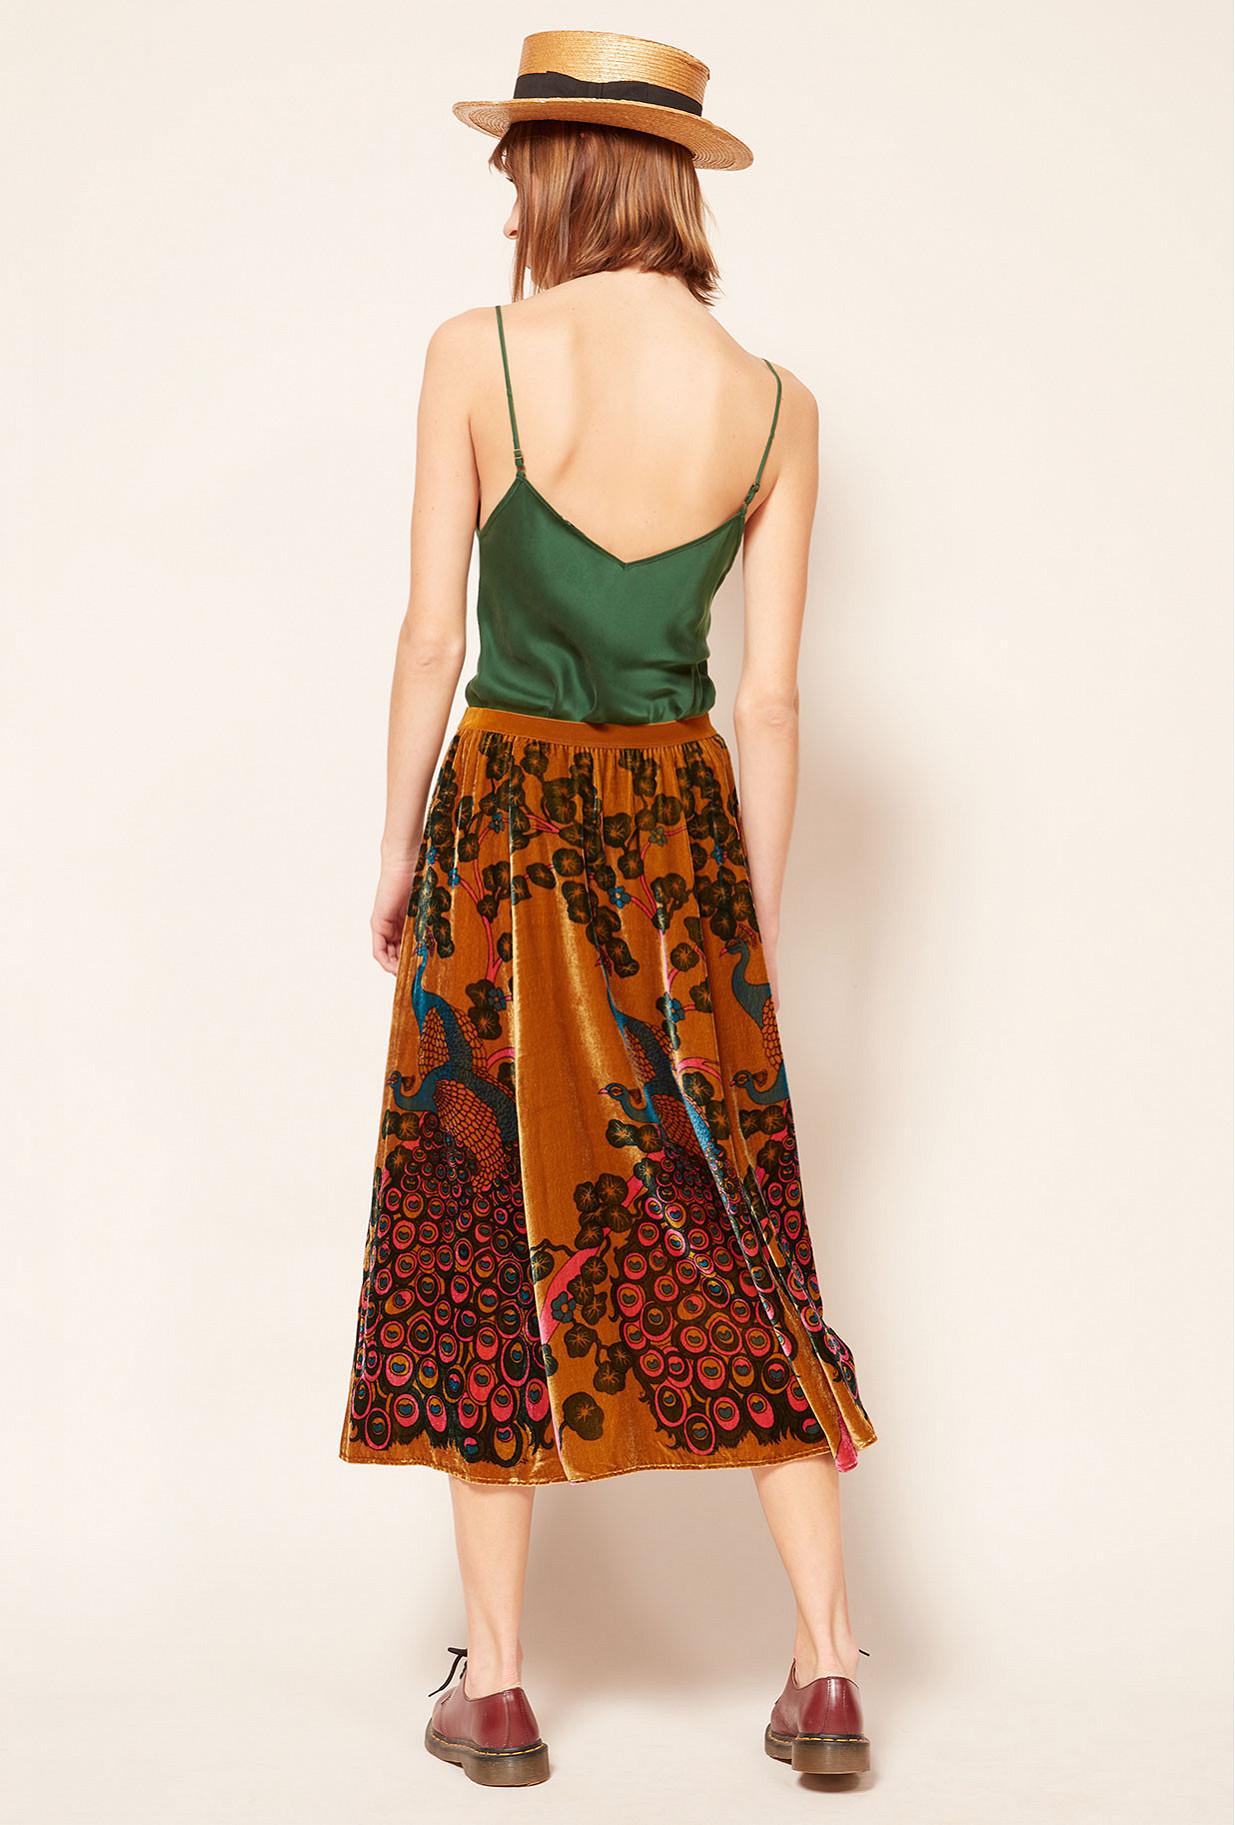 Paris clothes store Skirt  Parade french designer fashion Paris